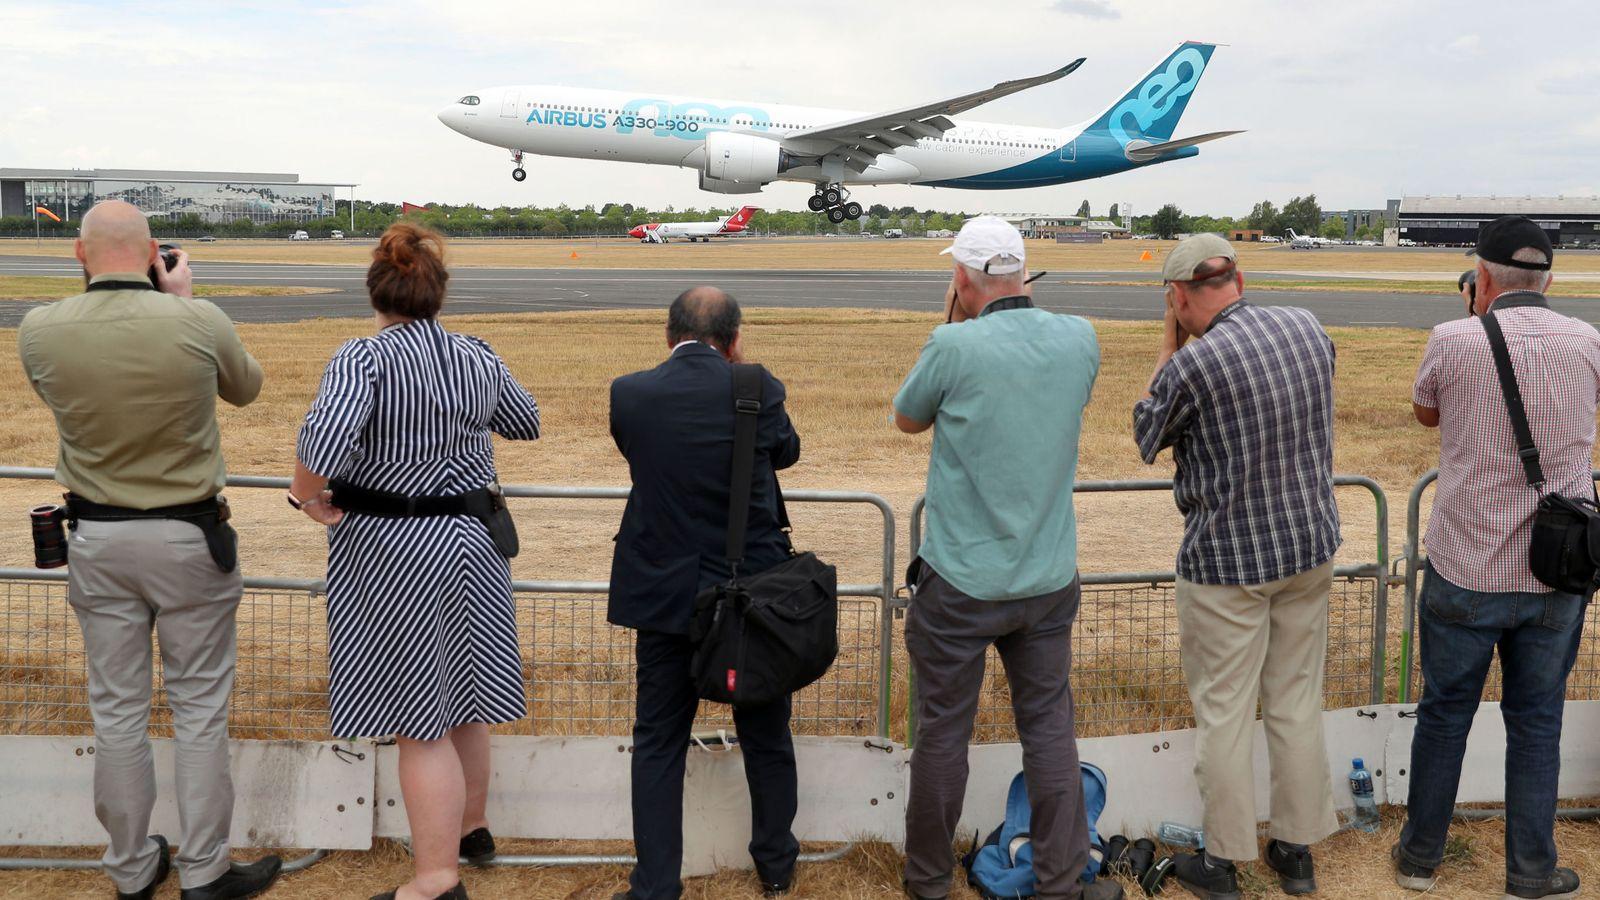 Canceled: Farnborough International Airshow latest victim of coronavirus